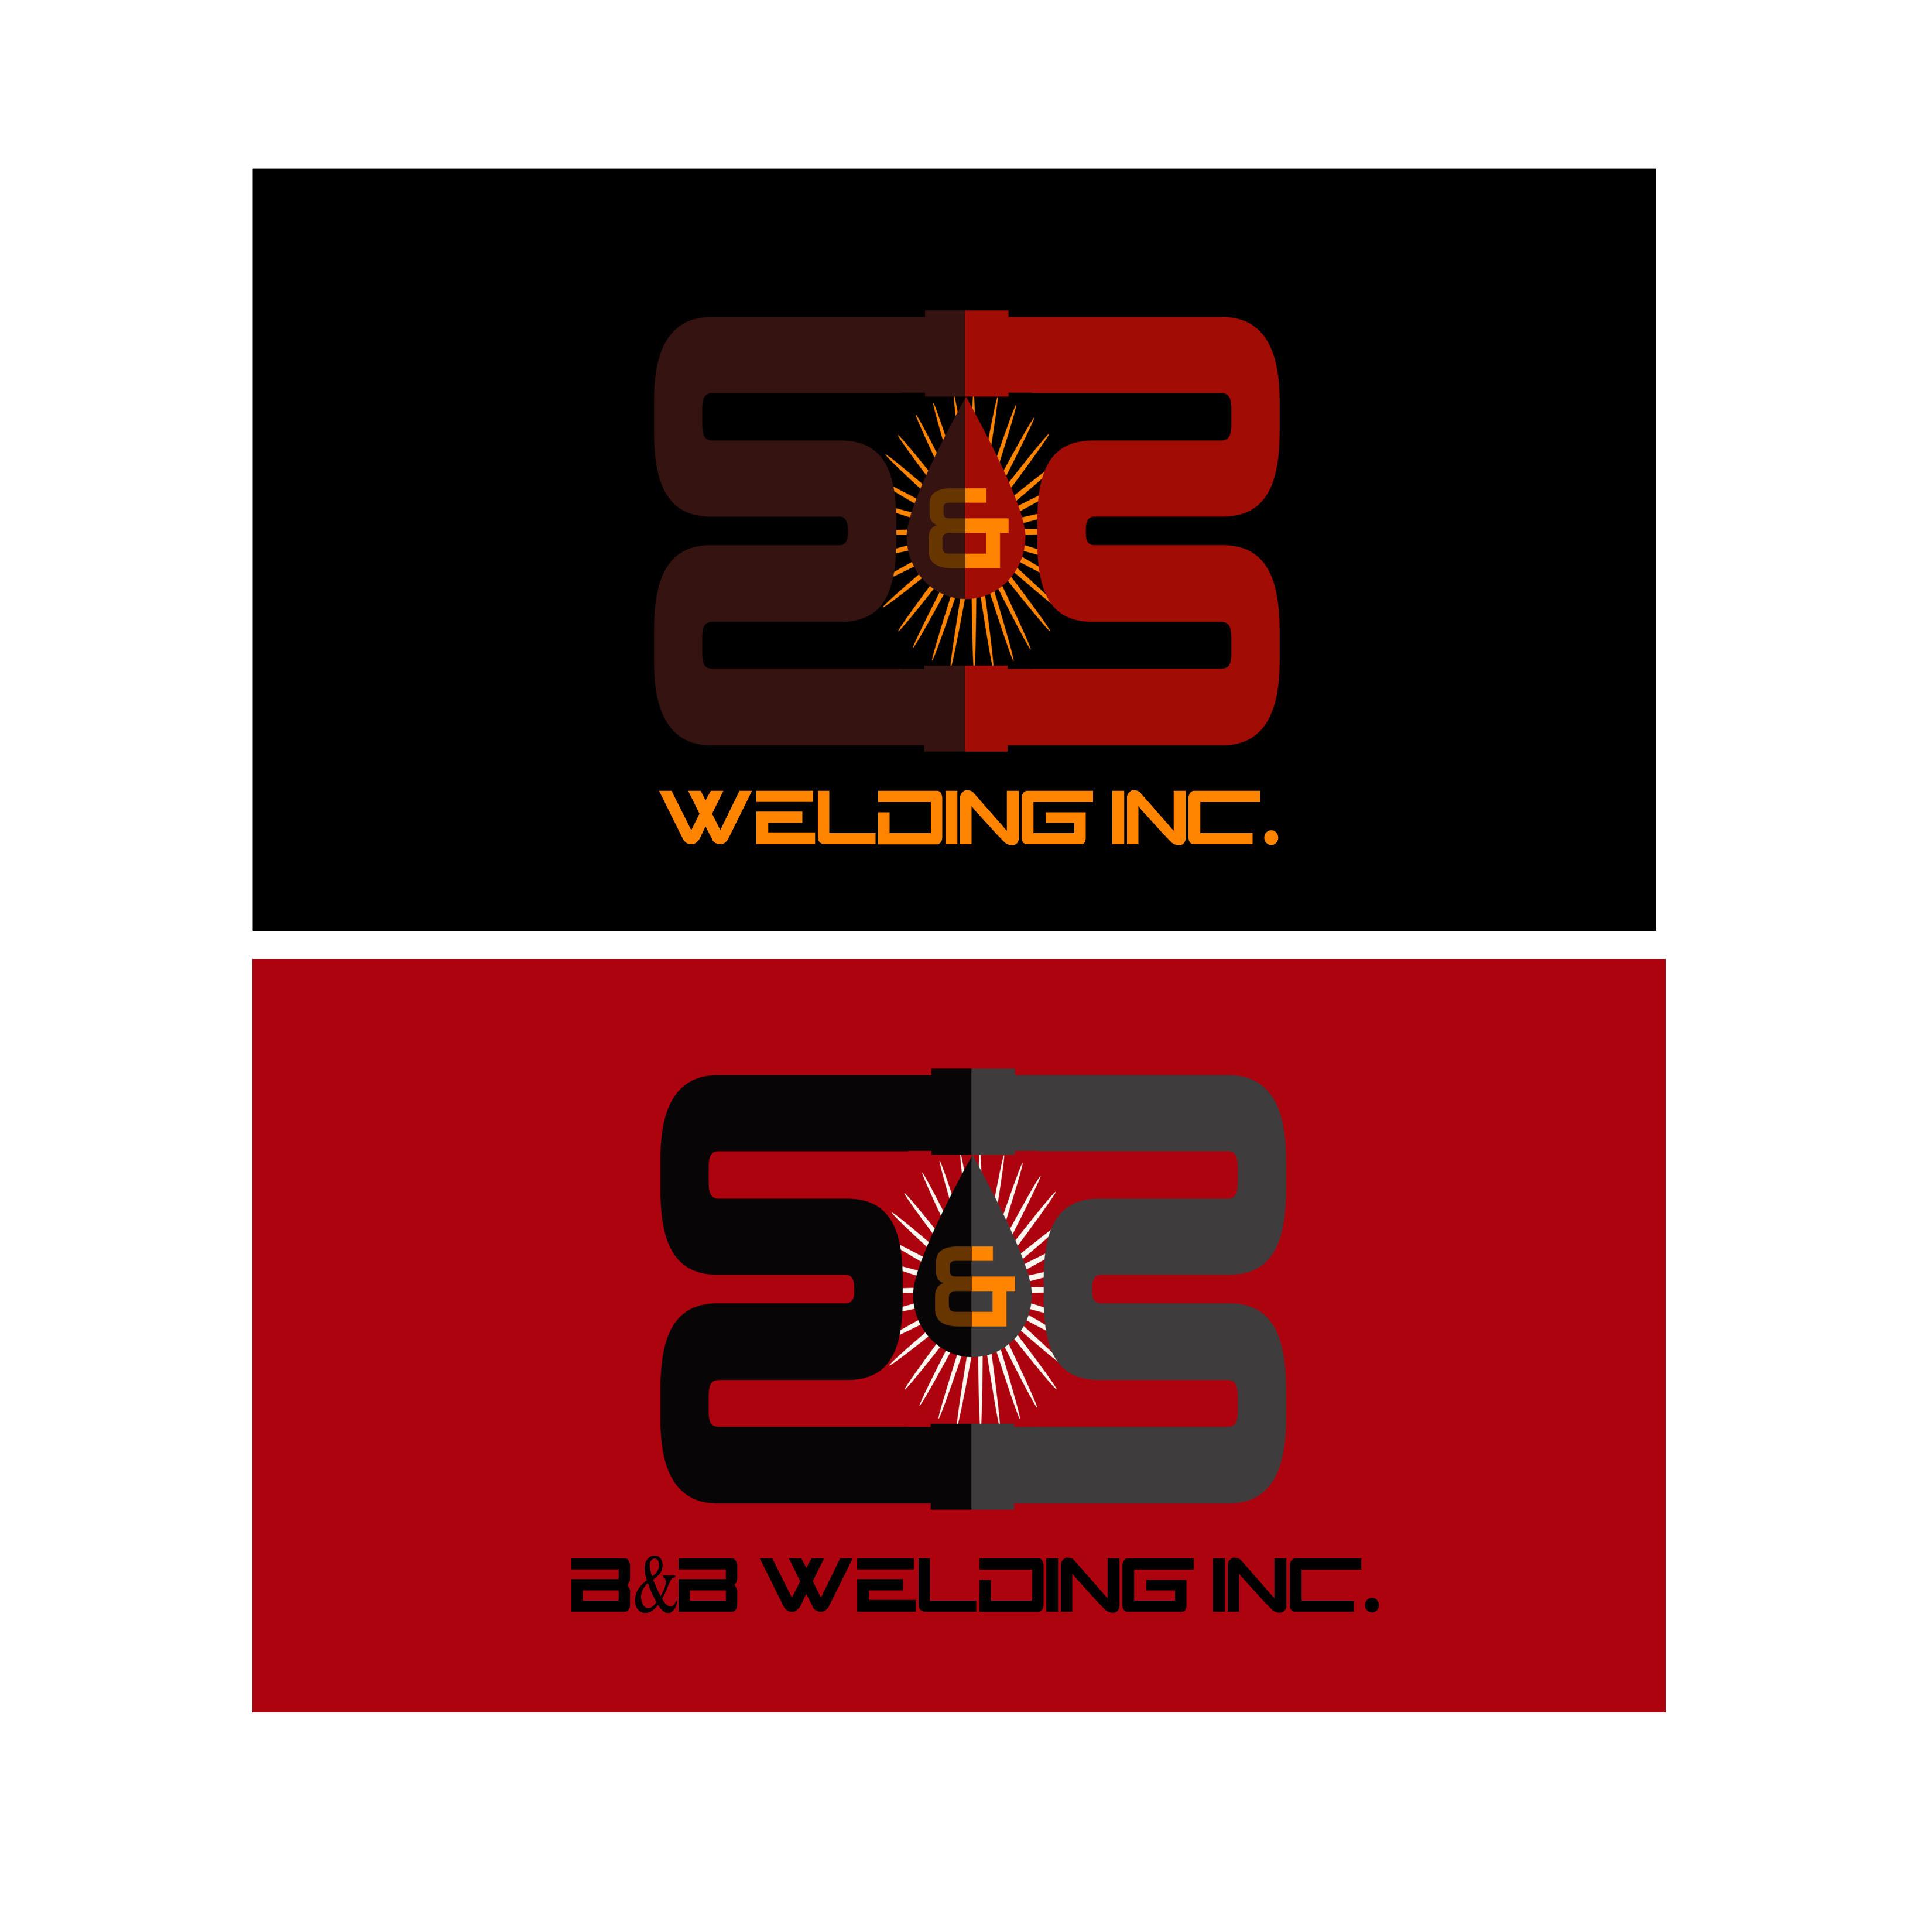 Logo Design by Allan Esclamado - Entry No. 52 in the Logo Design Contest Fun Logo Design for B&B Welding Inc..